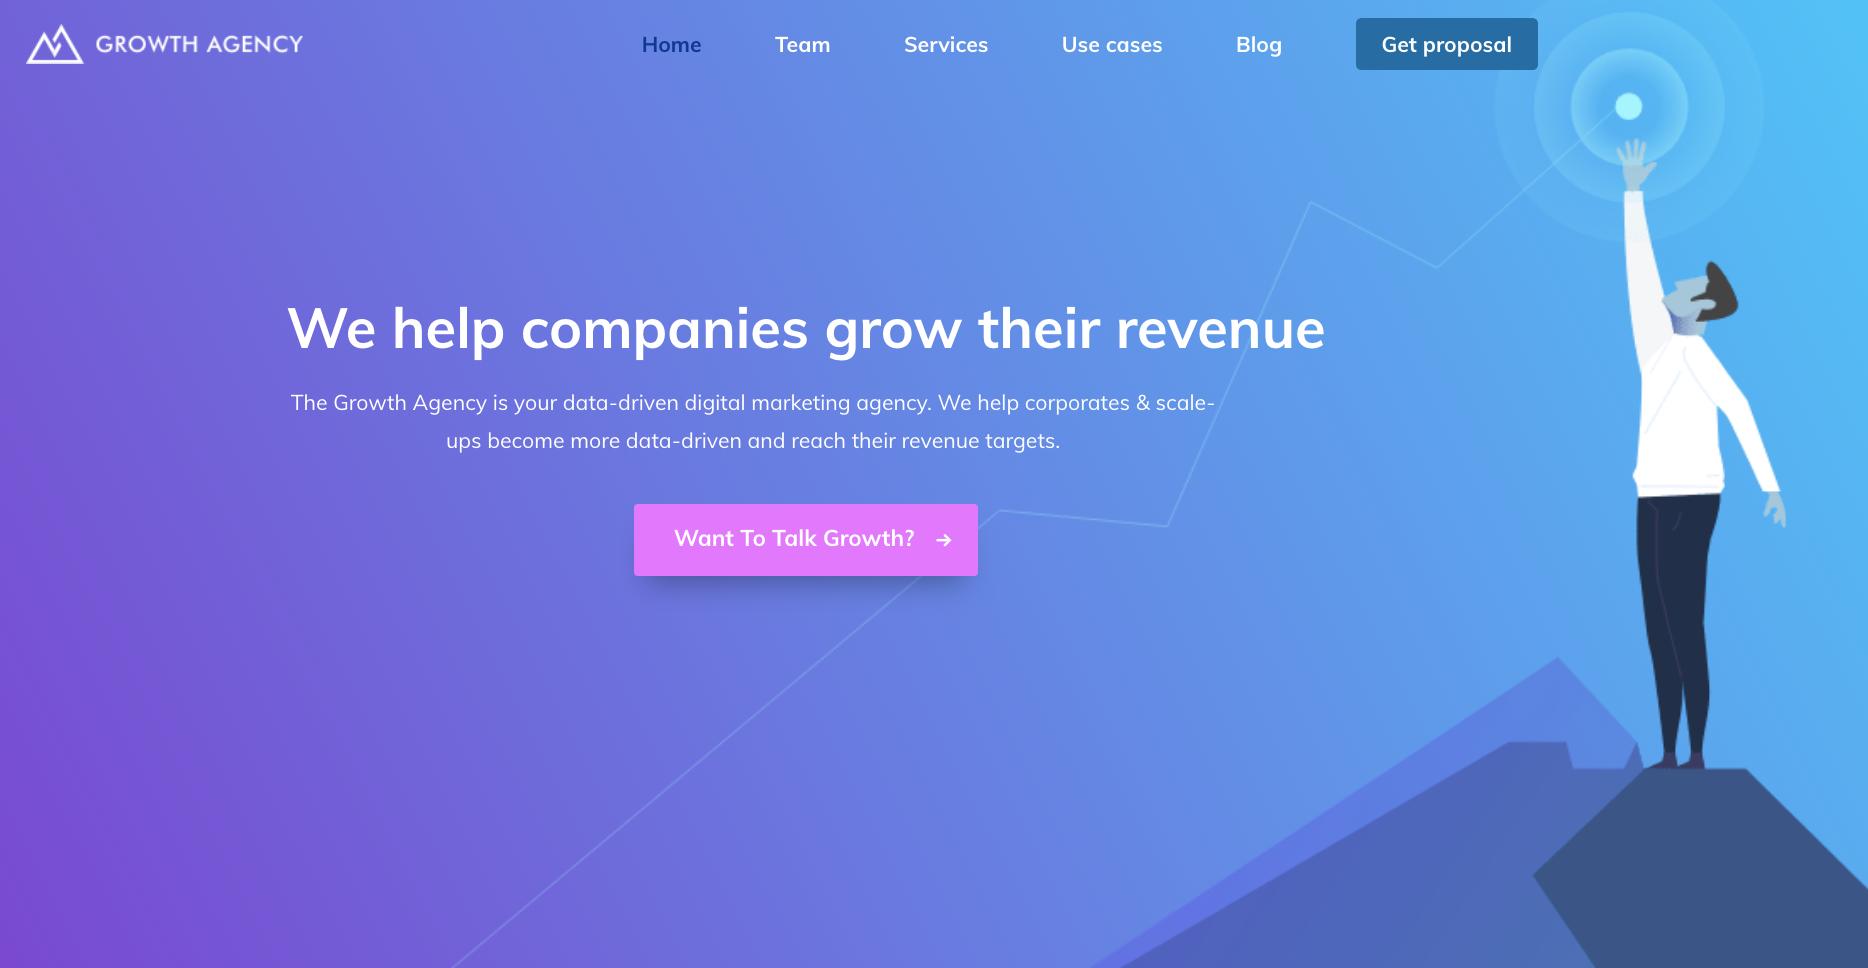 The Growth Agency | A Data-Driven Digital Marketing Agency